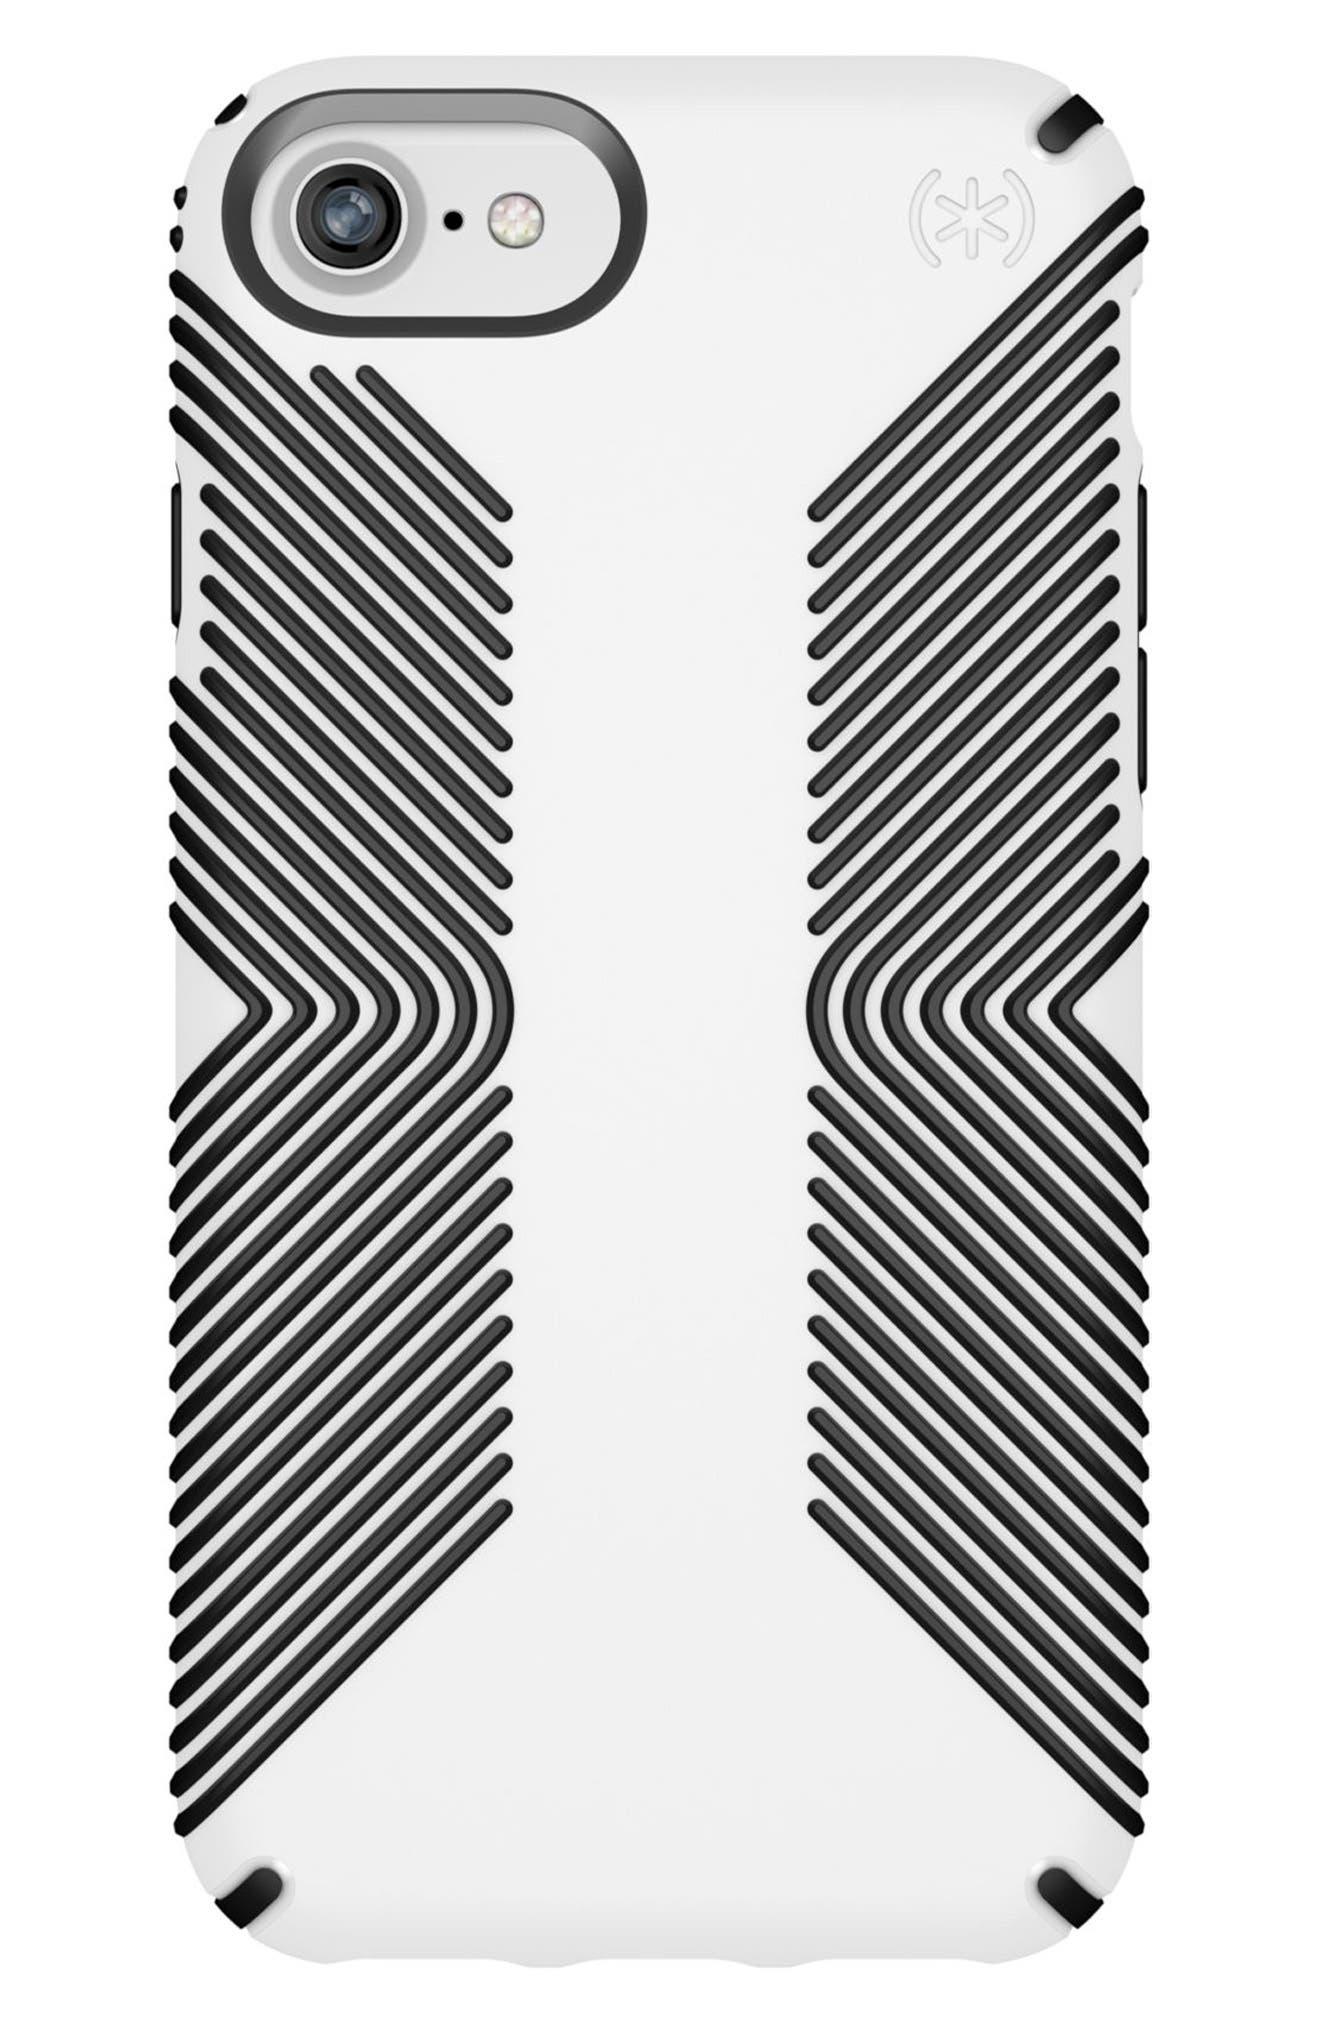 Grip iPhone 6/6s/7/8 Case,                         Main,                         color, White/ Black